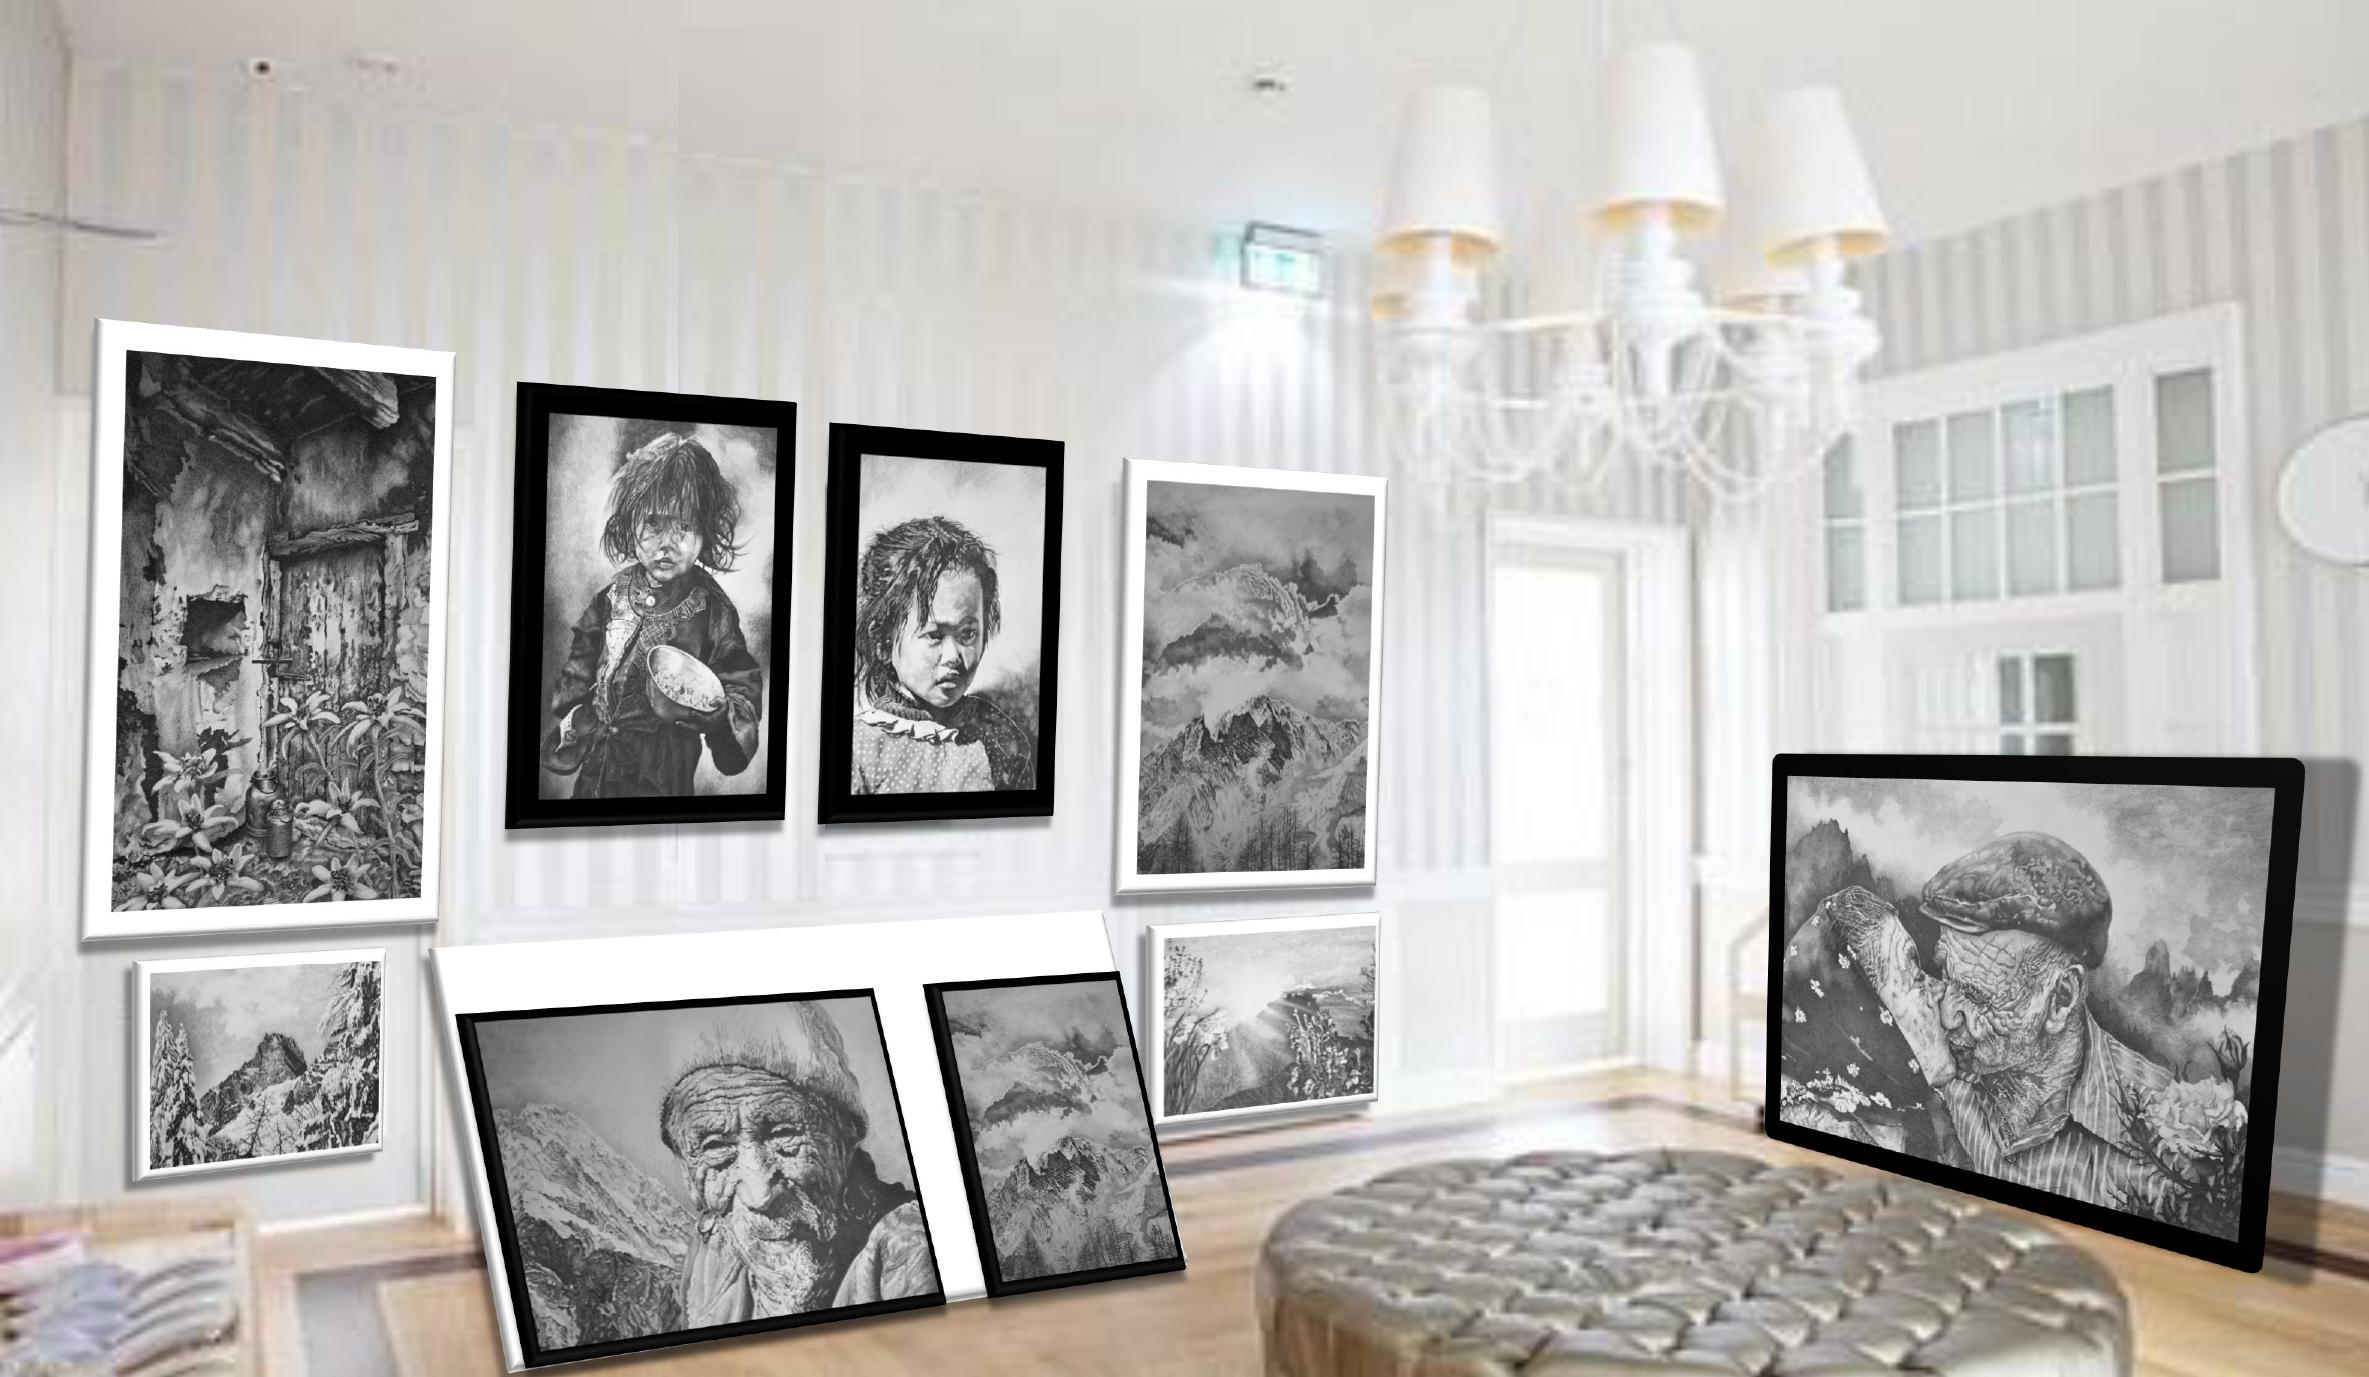 Giannino Scorzato in Soulharmony Gallery